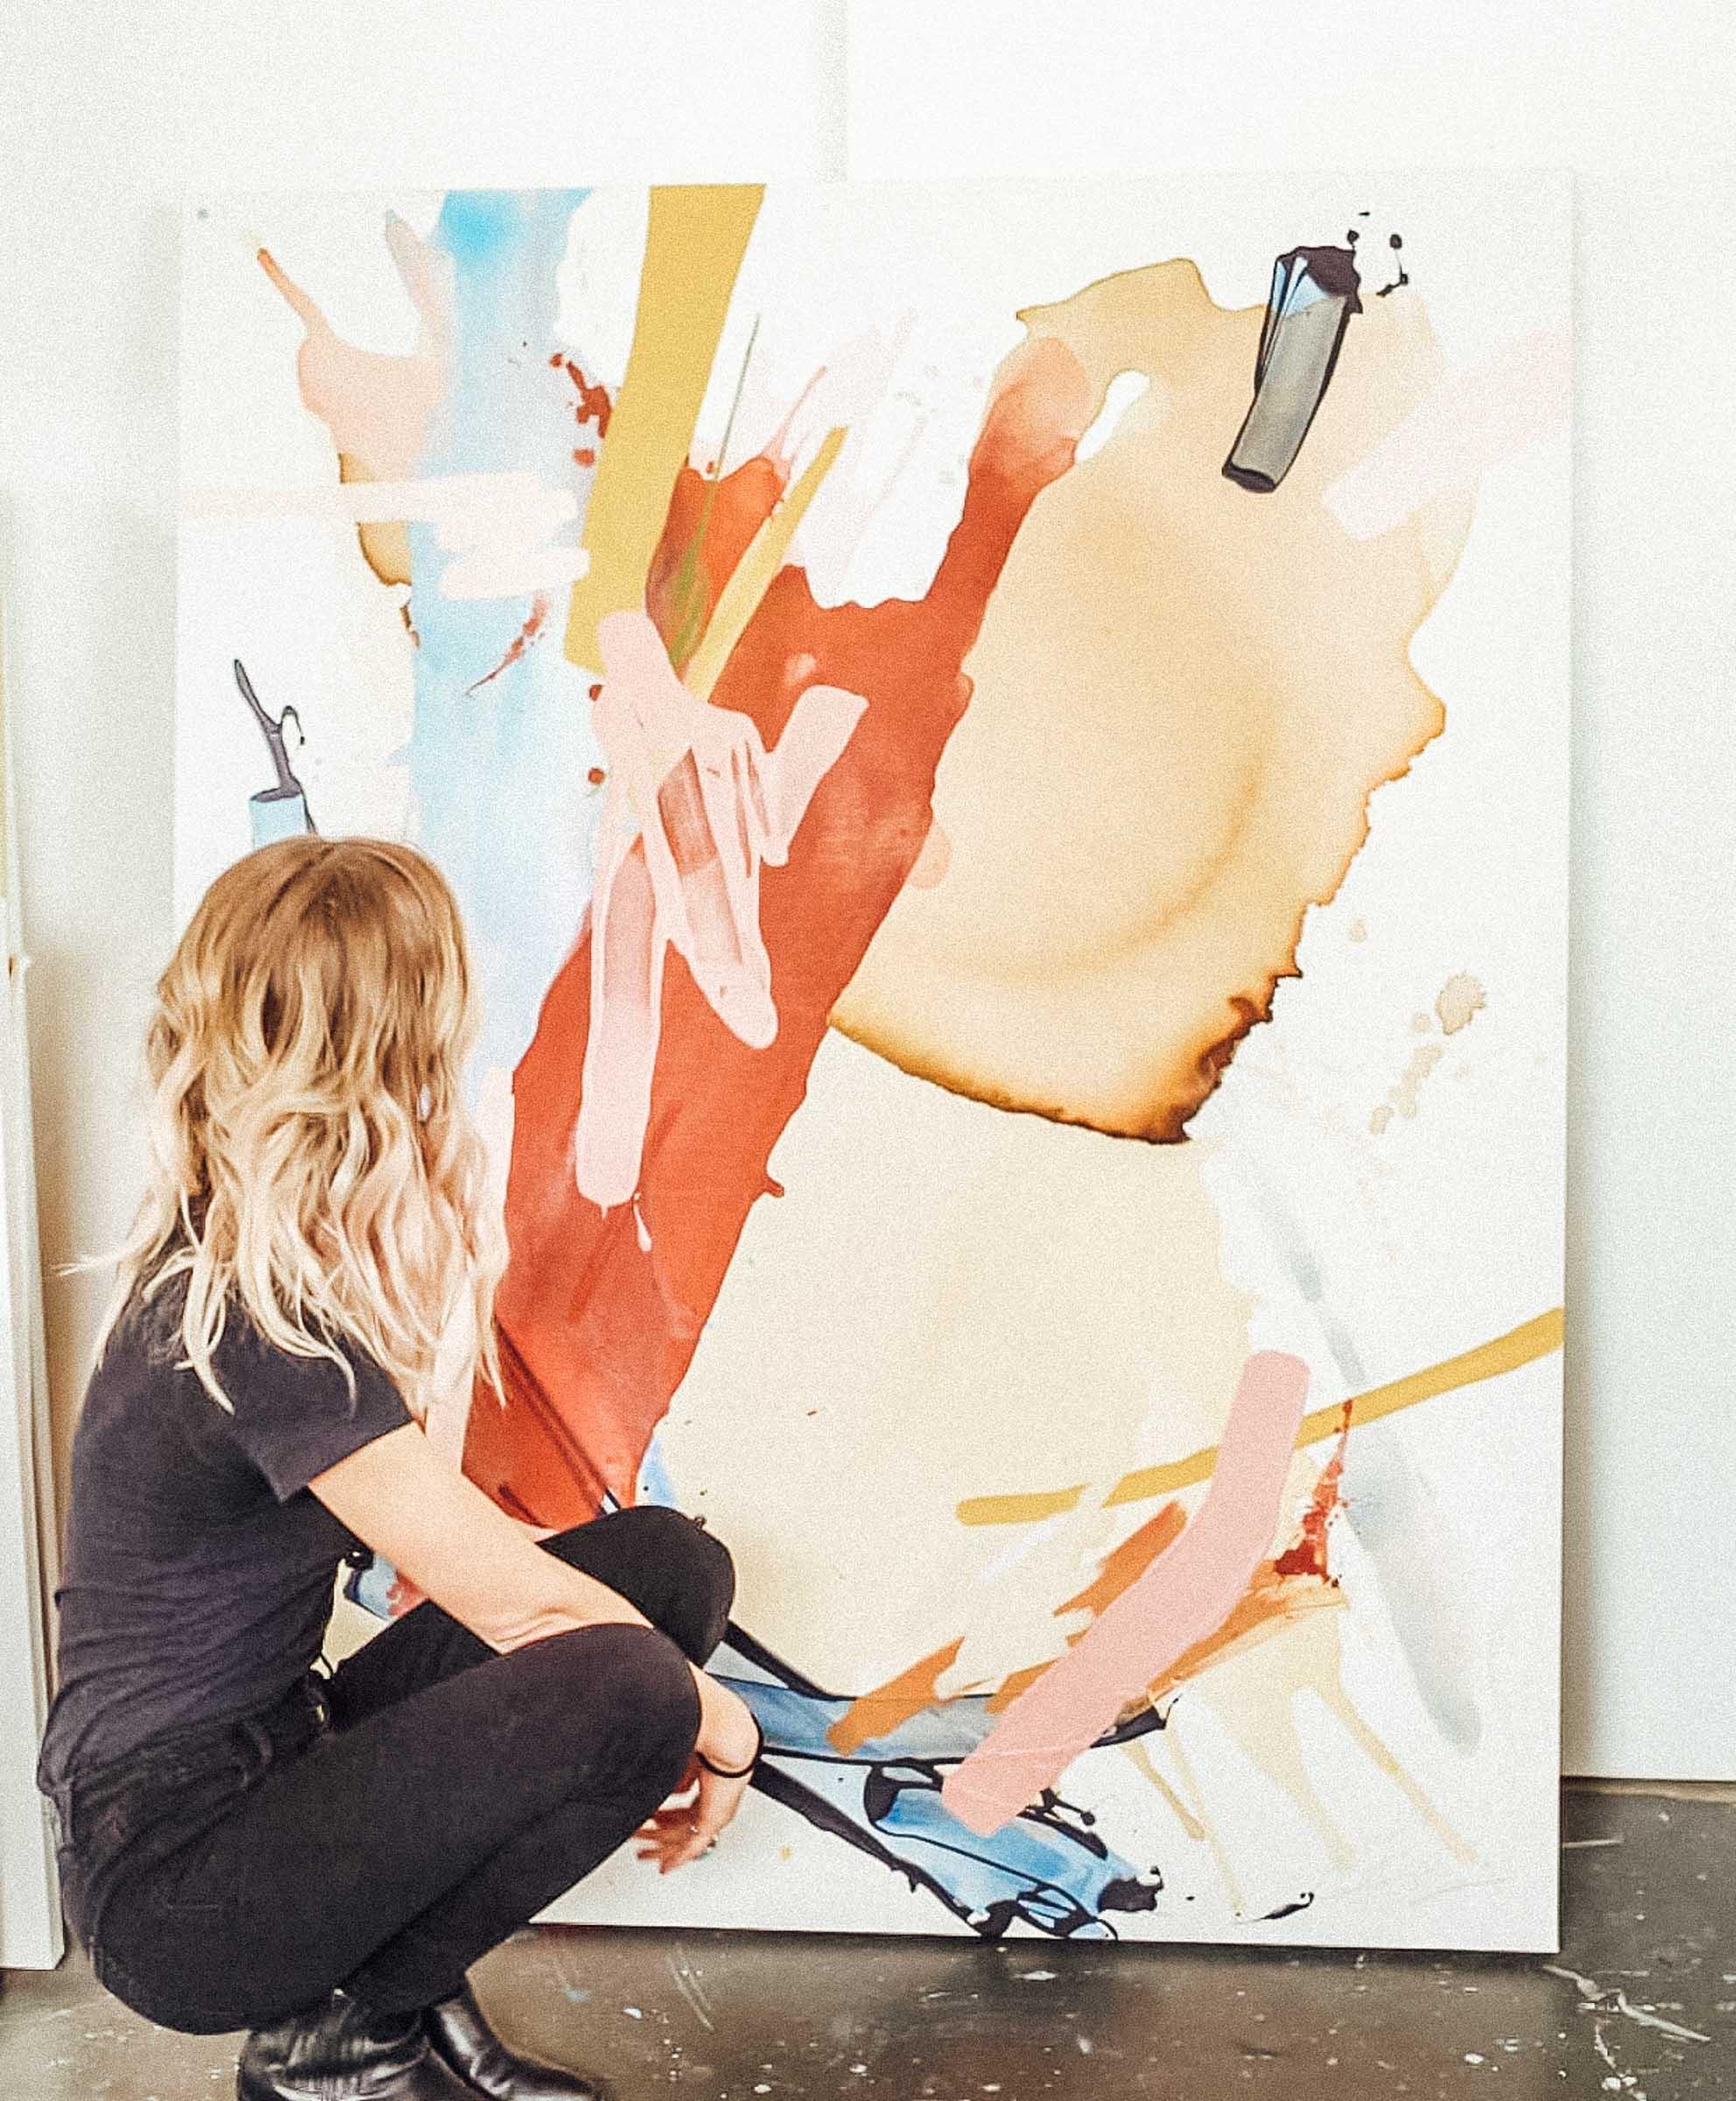 Chelsea_Michal_Garter_LightConversations_LightGalleryGR_GrandRapids_ArtsPodcast-4.jpg